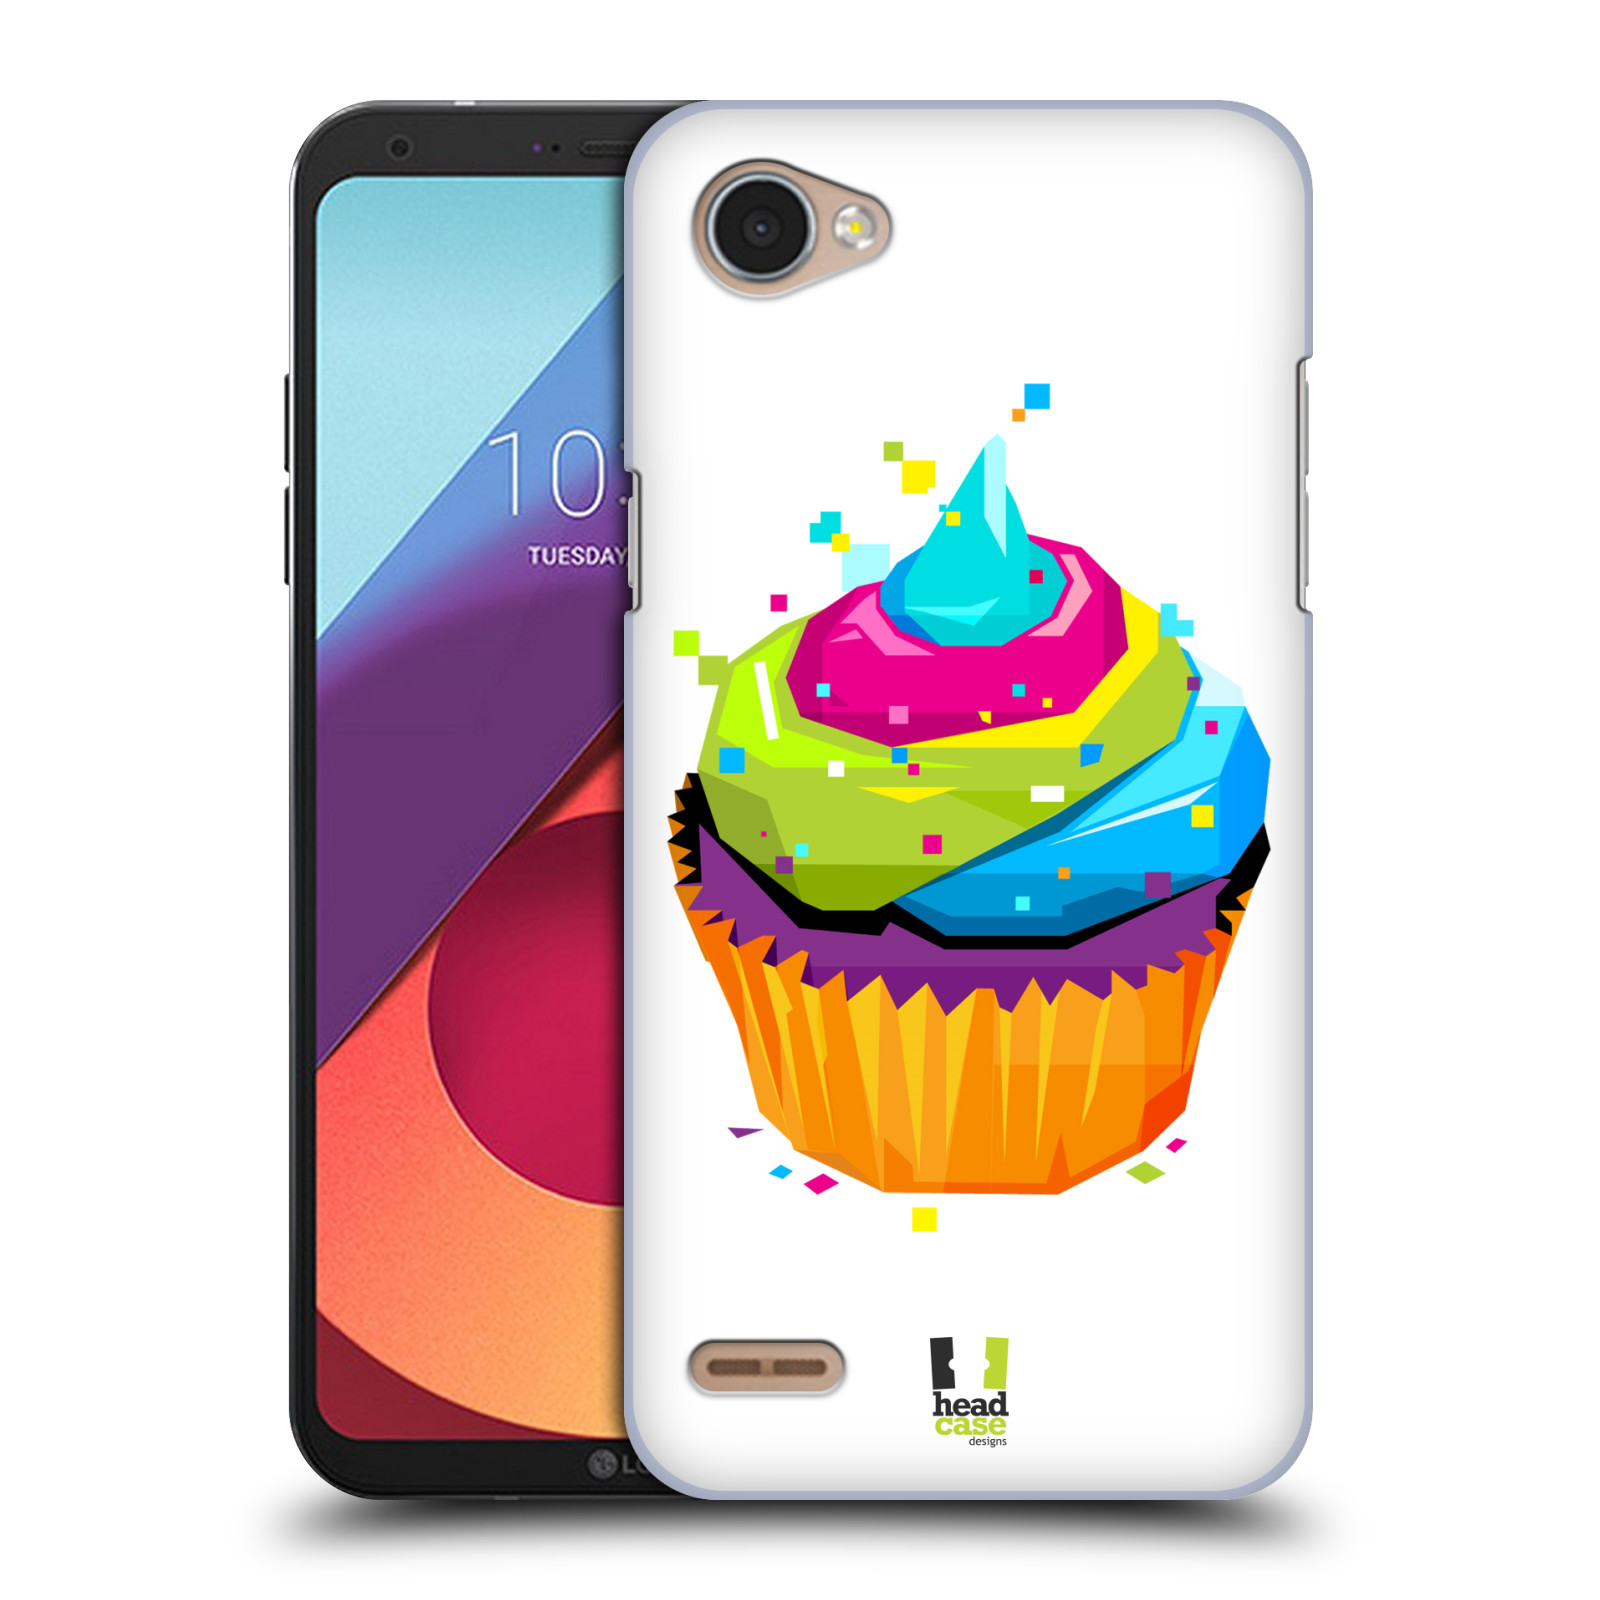 HEAD CASE plastový obal na mobil LG Q6 / Q6 PLUS vzor POP ART kubismus dortík